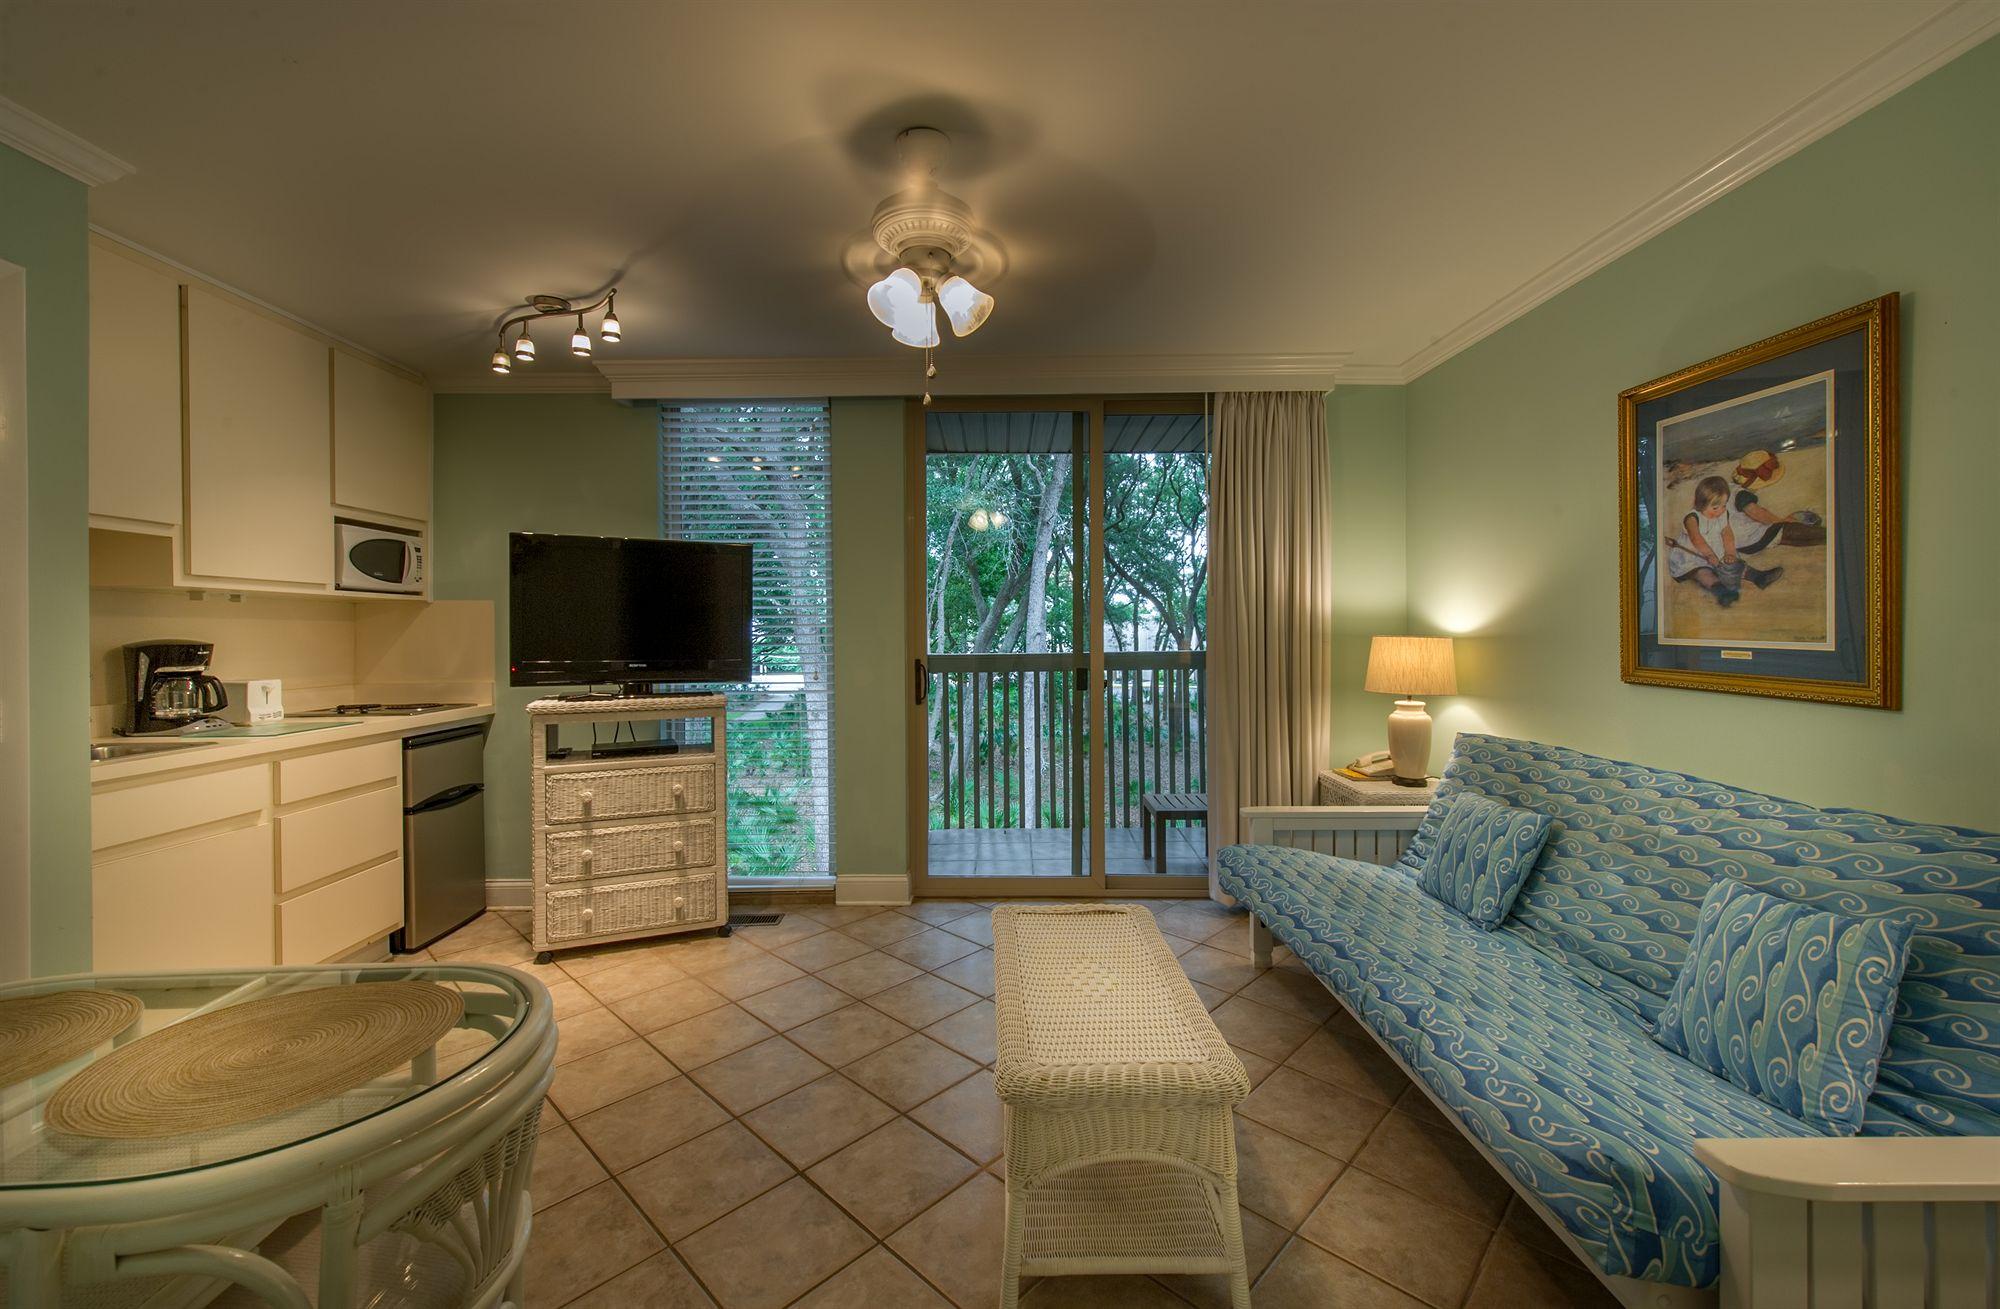 Villas By the Sea Resort & Conference Center in Jekyll Island, GA